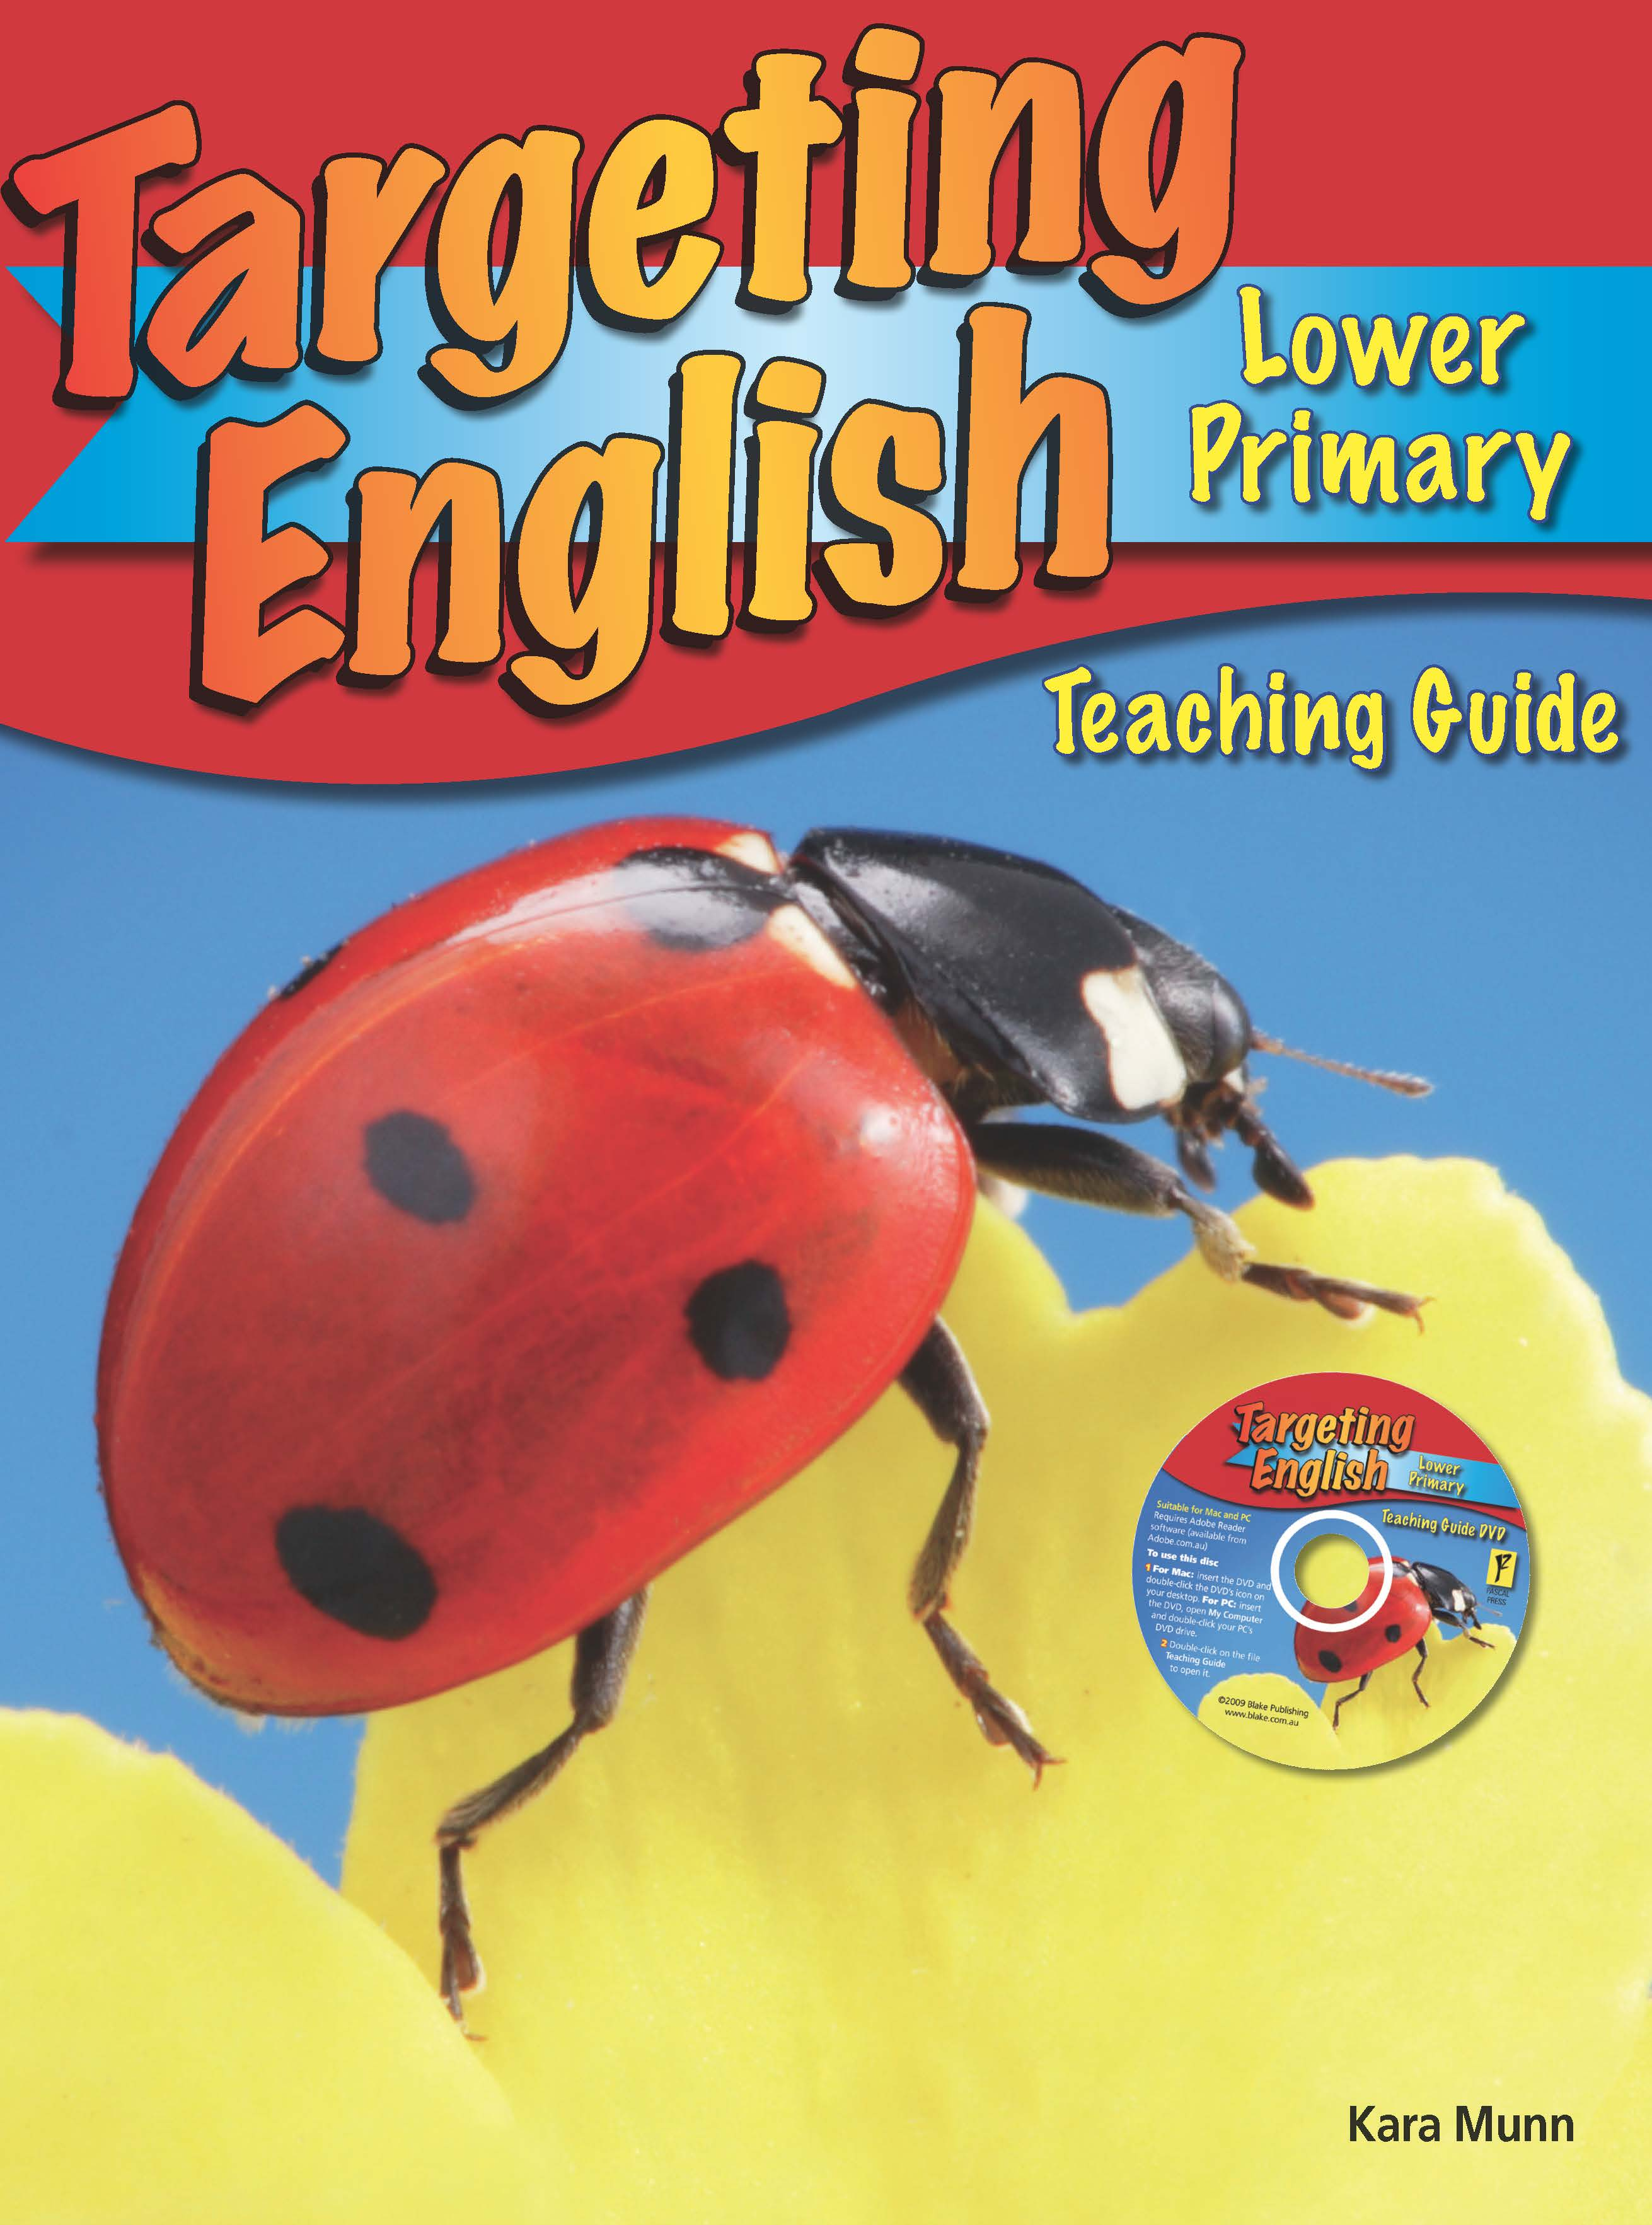 Targeting English Teaching Guide Lower Primary